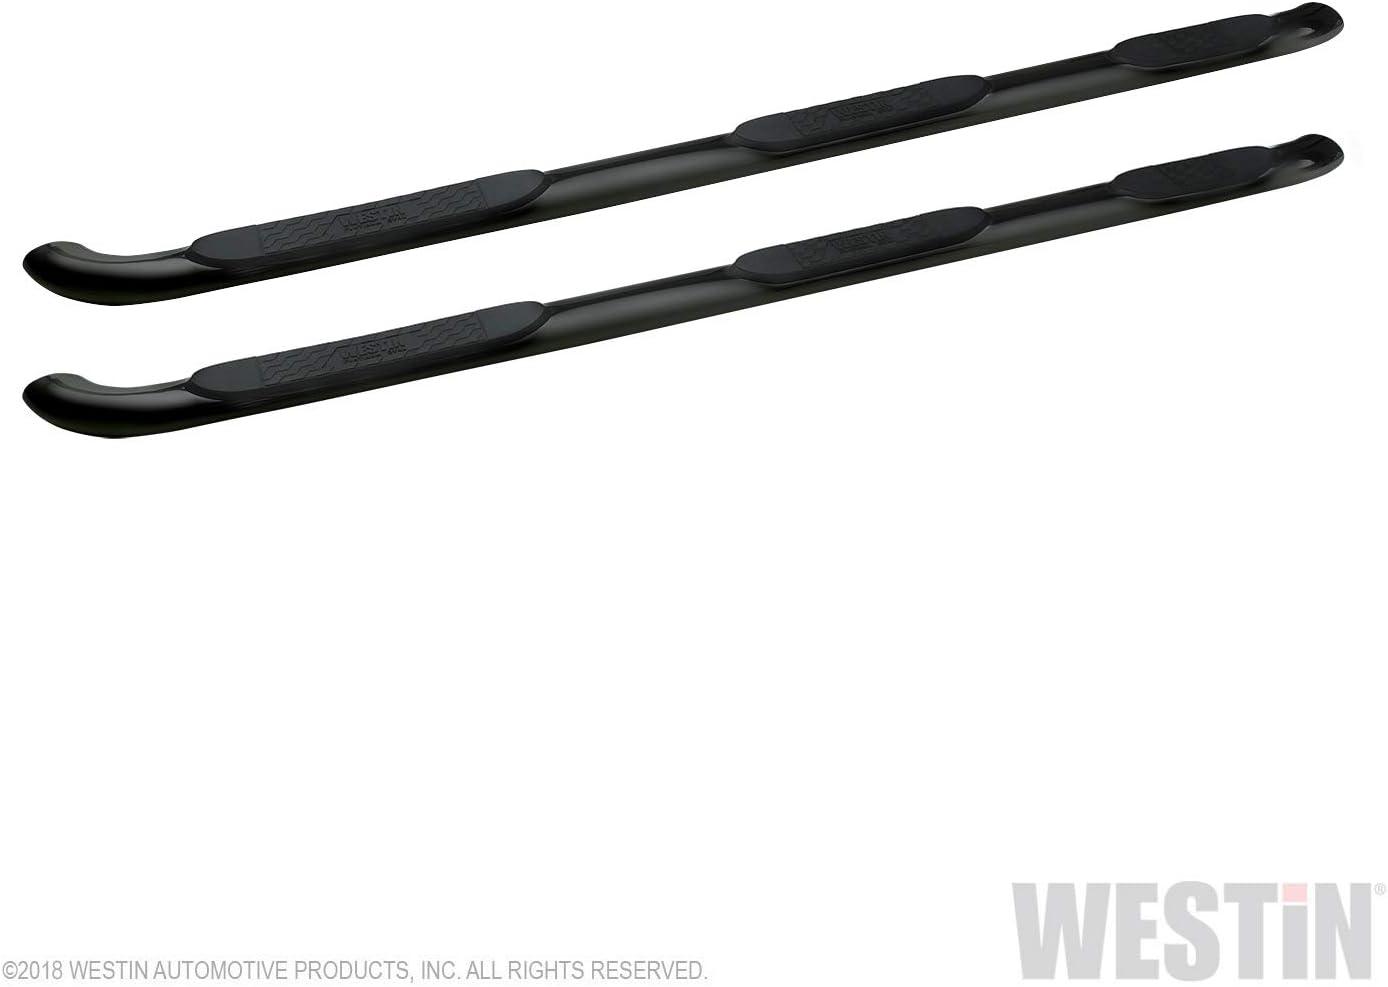 Westin 24-54585 Black 4 Platinum Oval Wheel-to-Wheel Step Bar